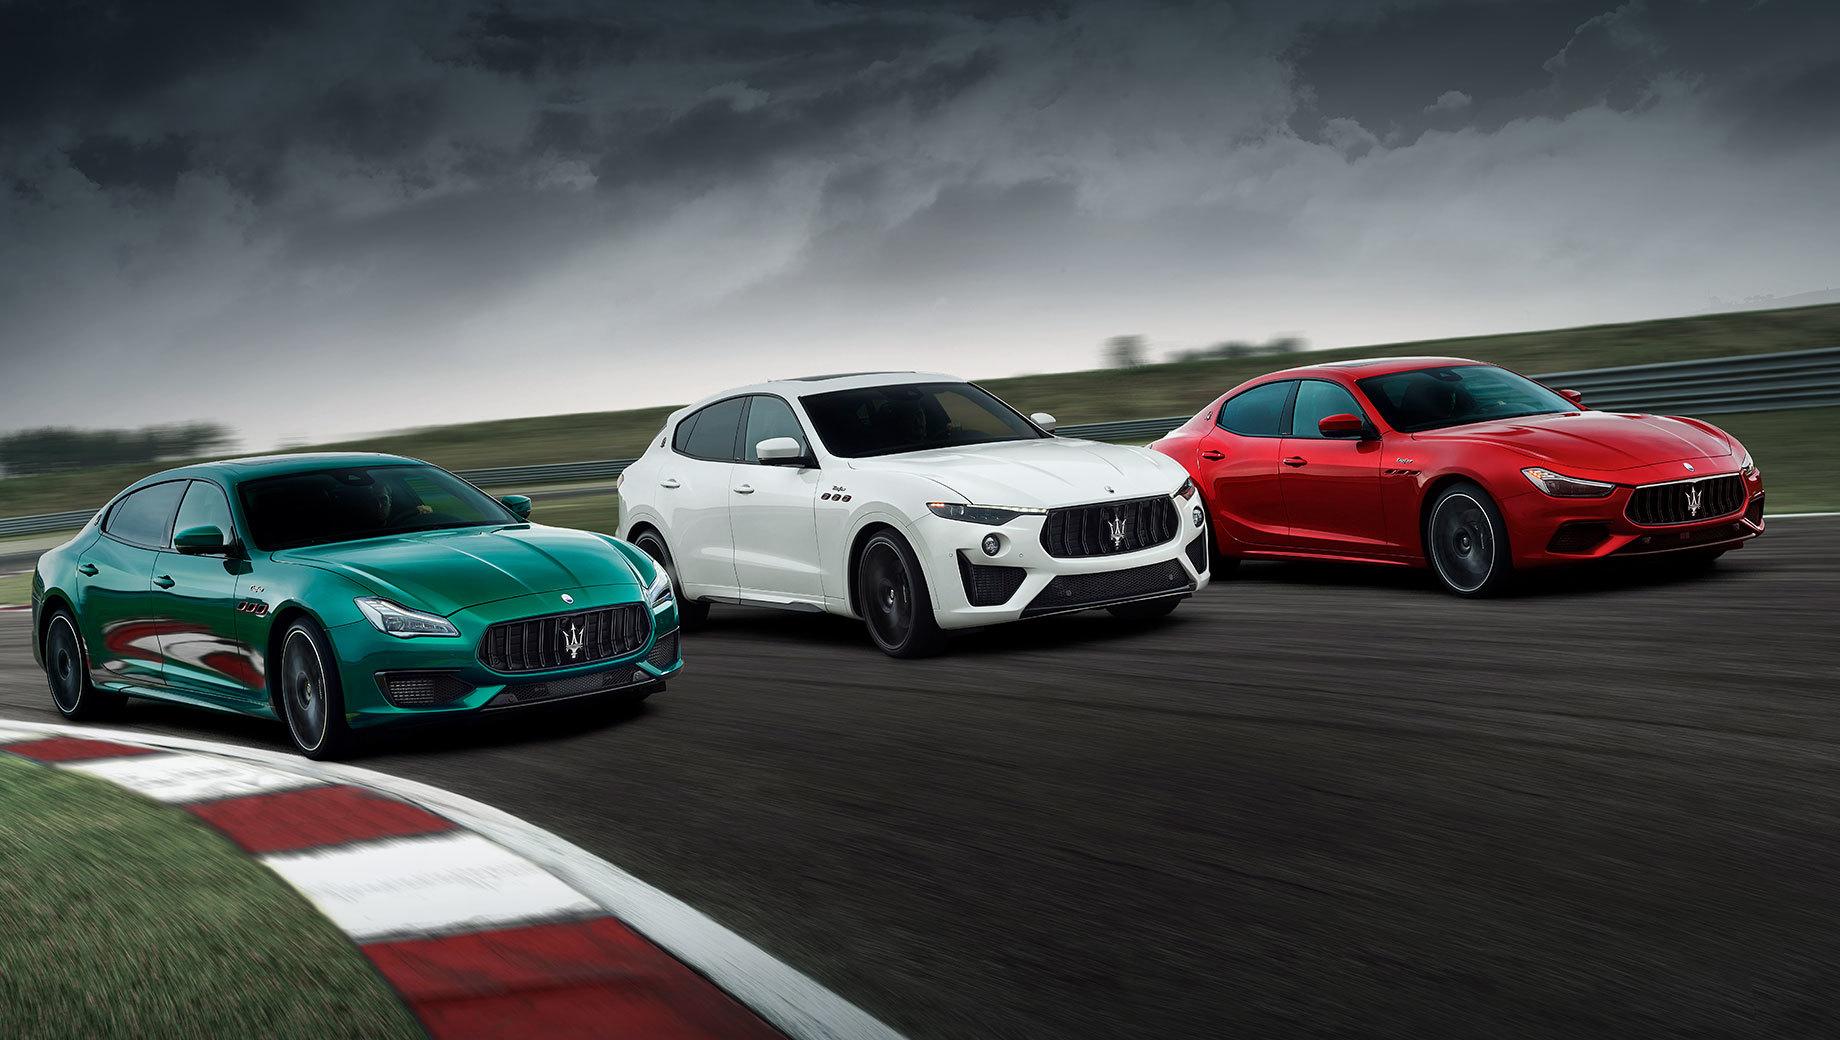 Maserati Ghibli и Quattroporte включены в линейку Trofeo